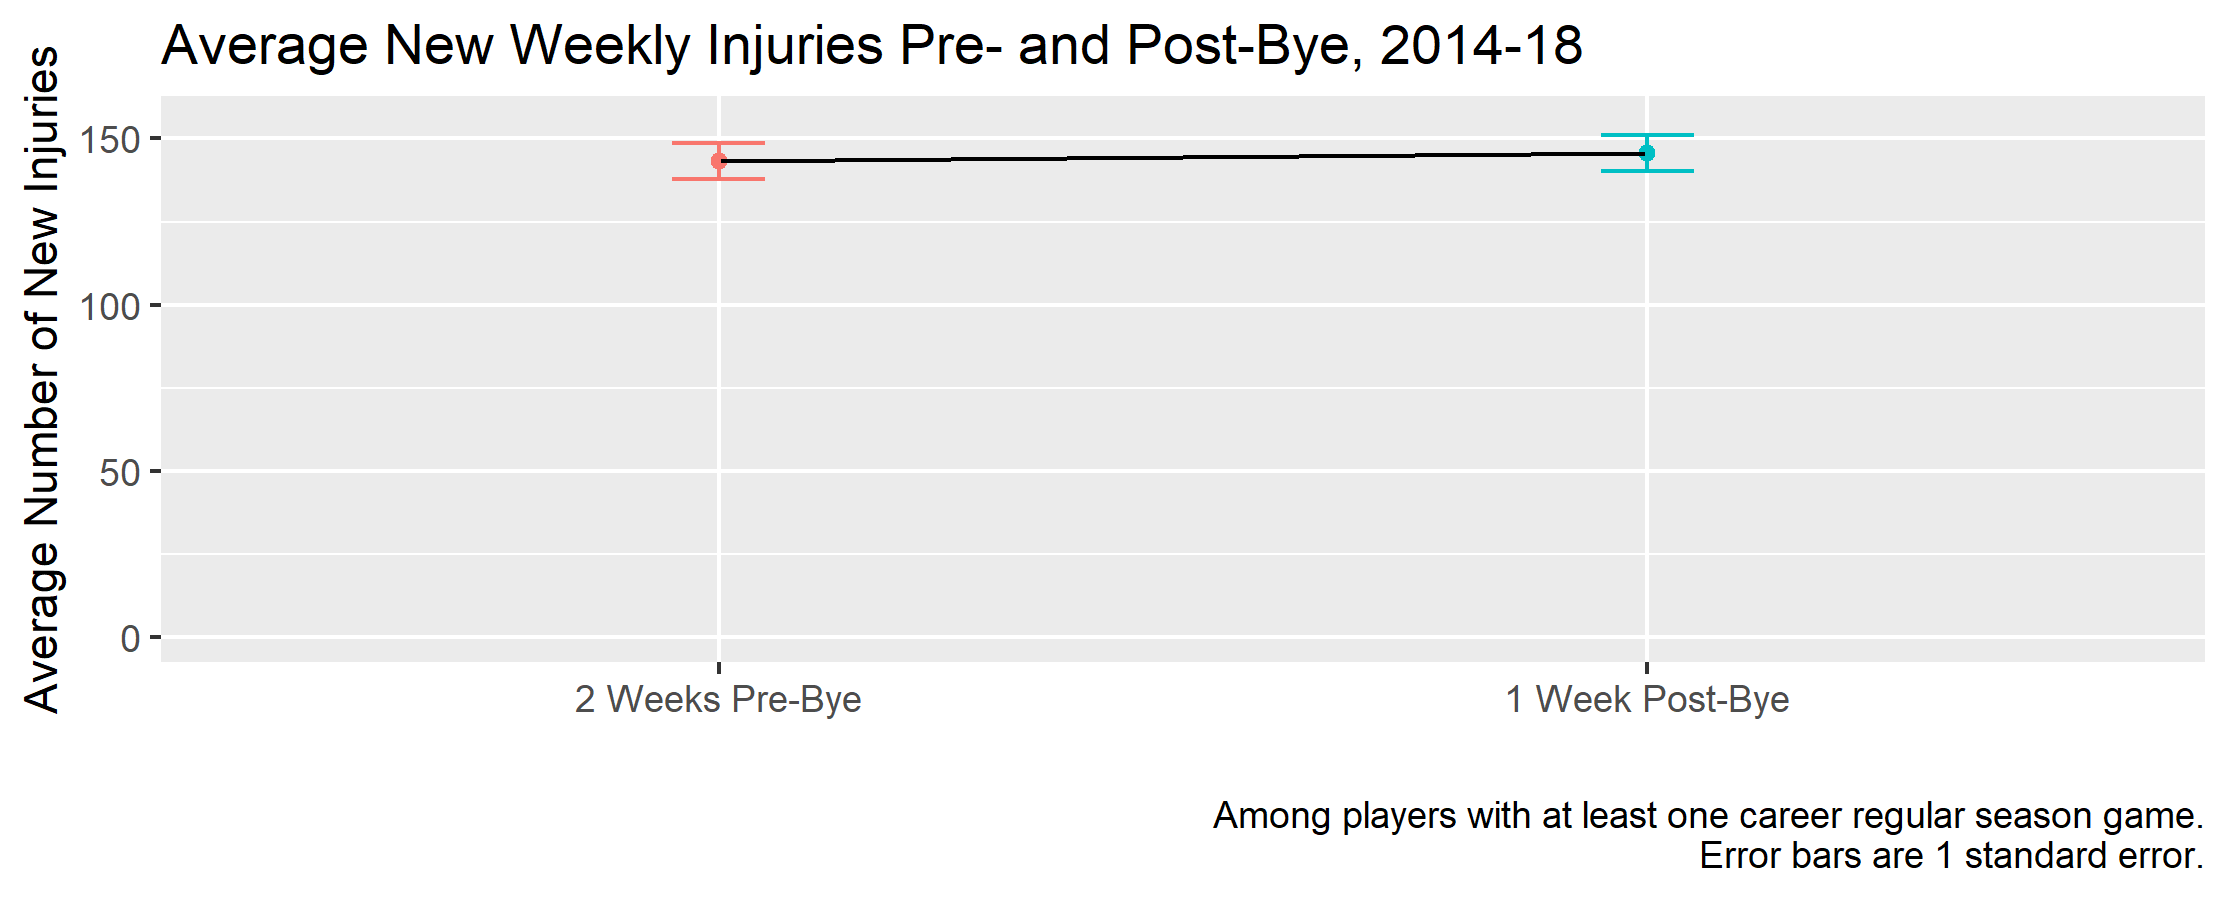 Injuries before and after bye weeks